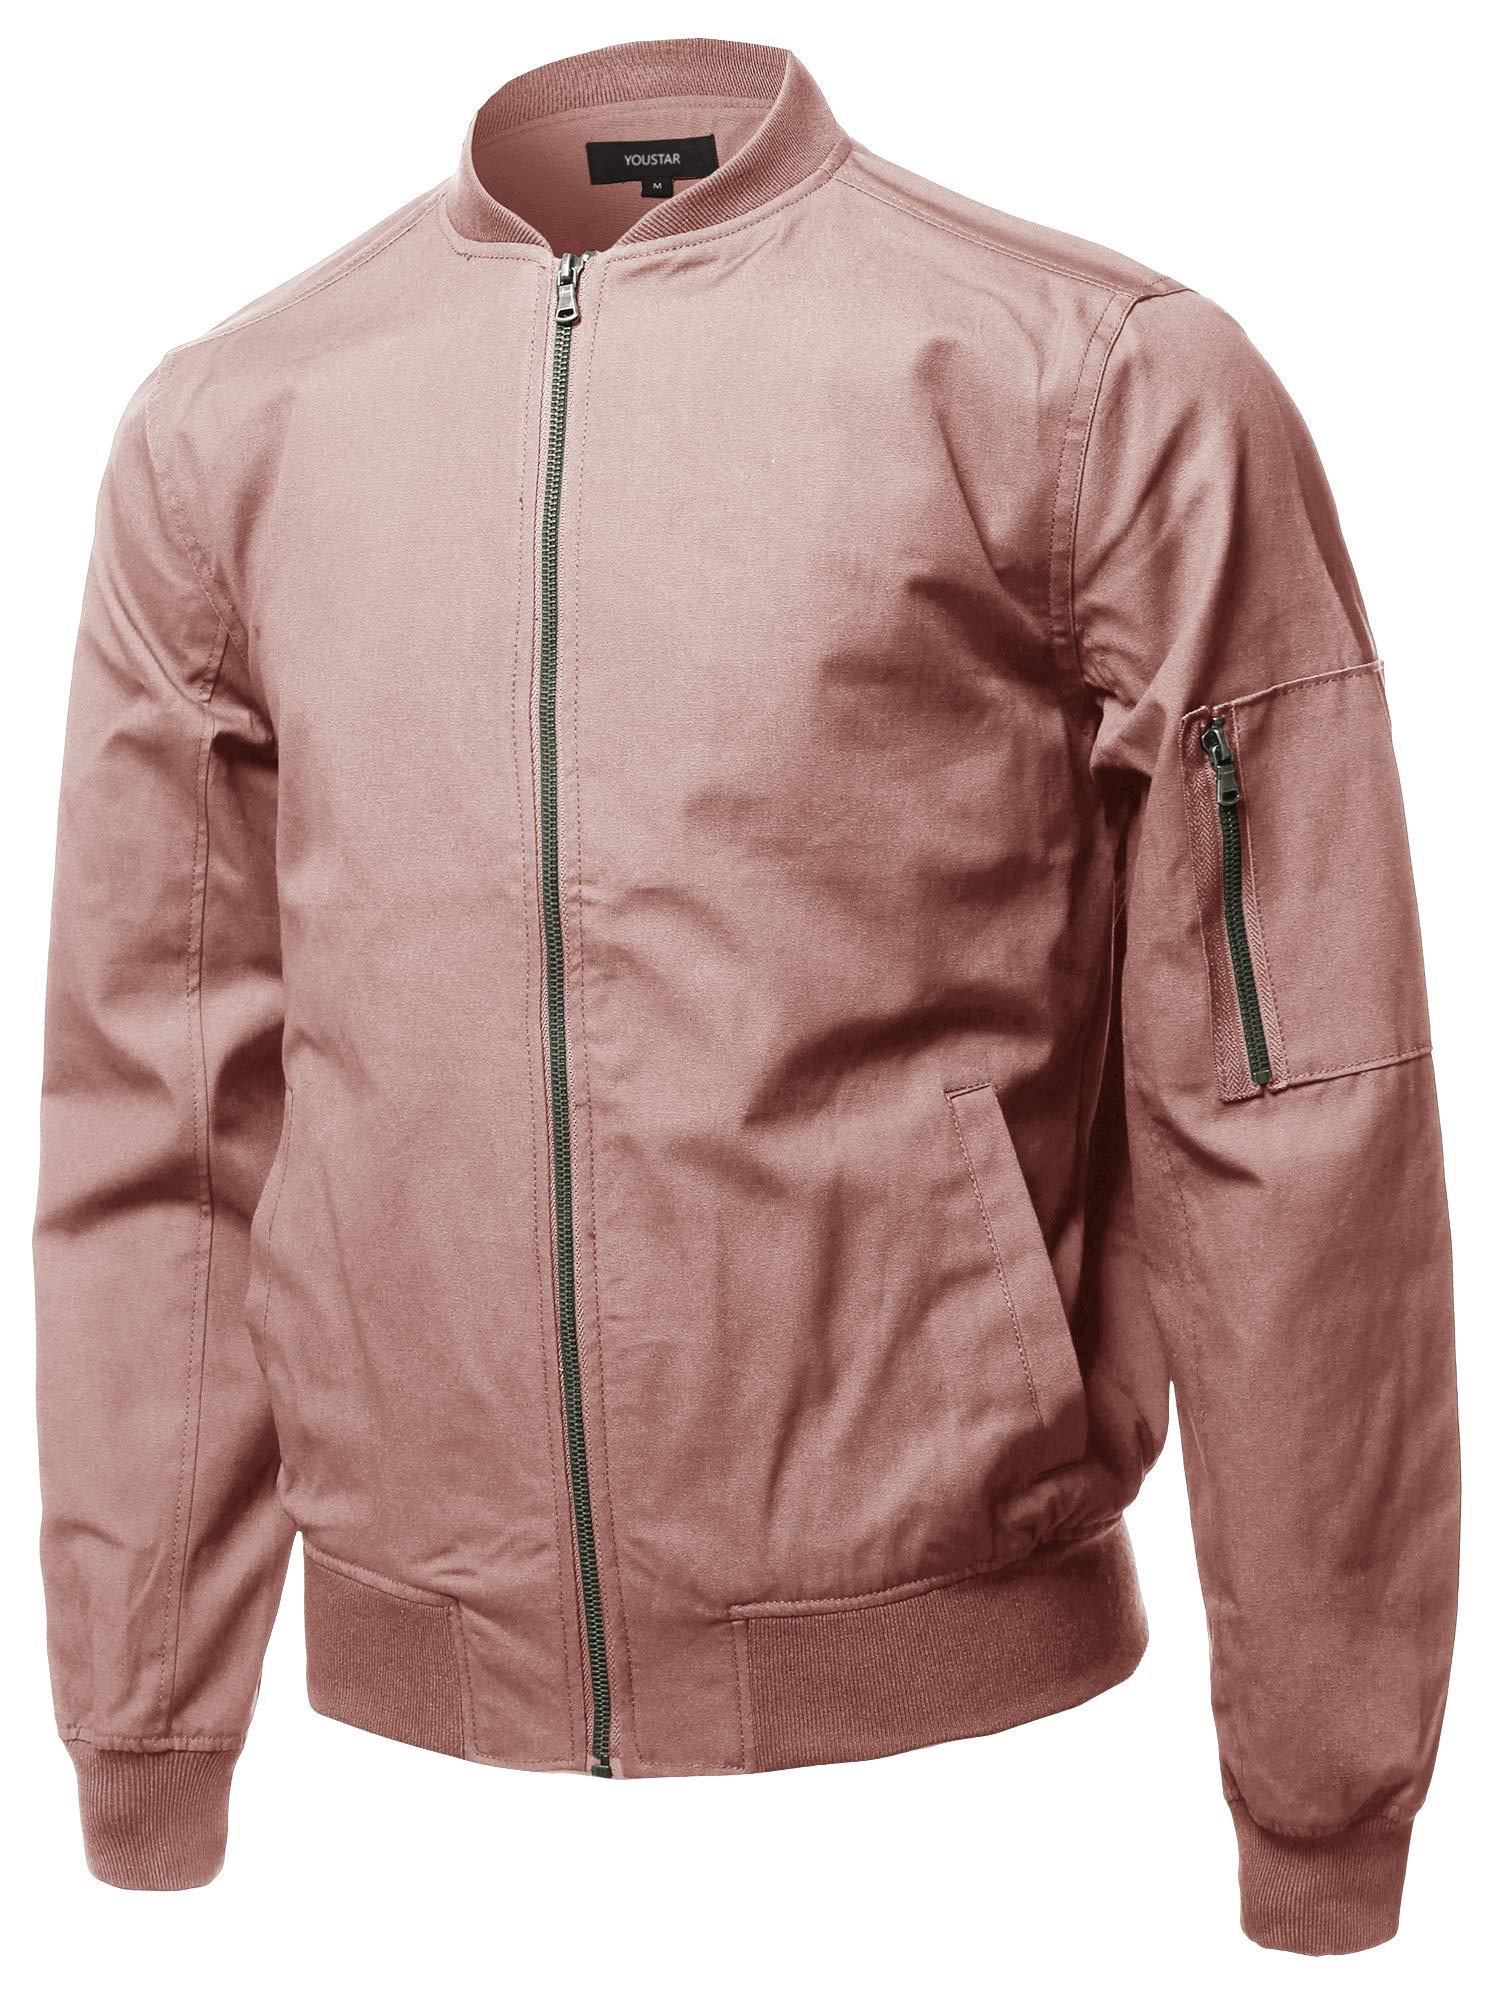 f587a8622b6 Men's Classic Basic Style Zip Up Long Sleeves Windbreaker Bomber ...